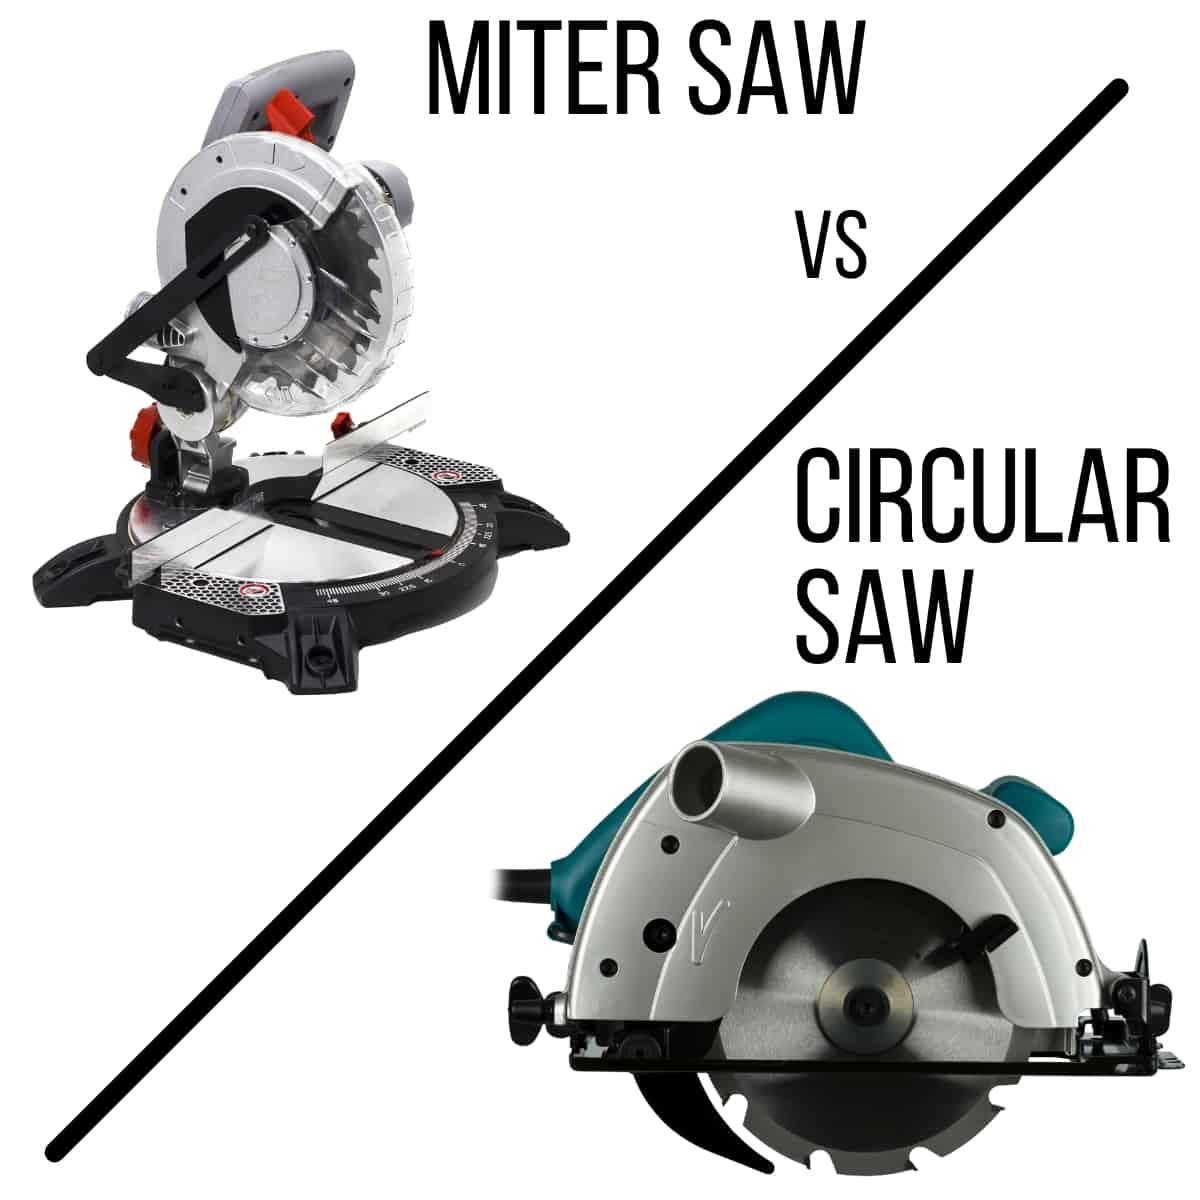 miter saw vs circular saw with diagonal line between them